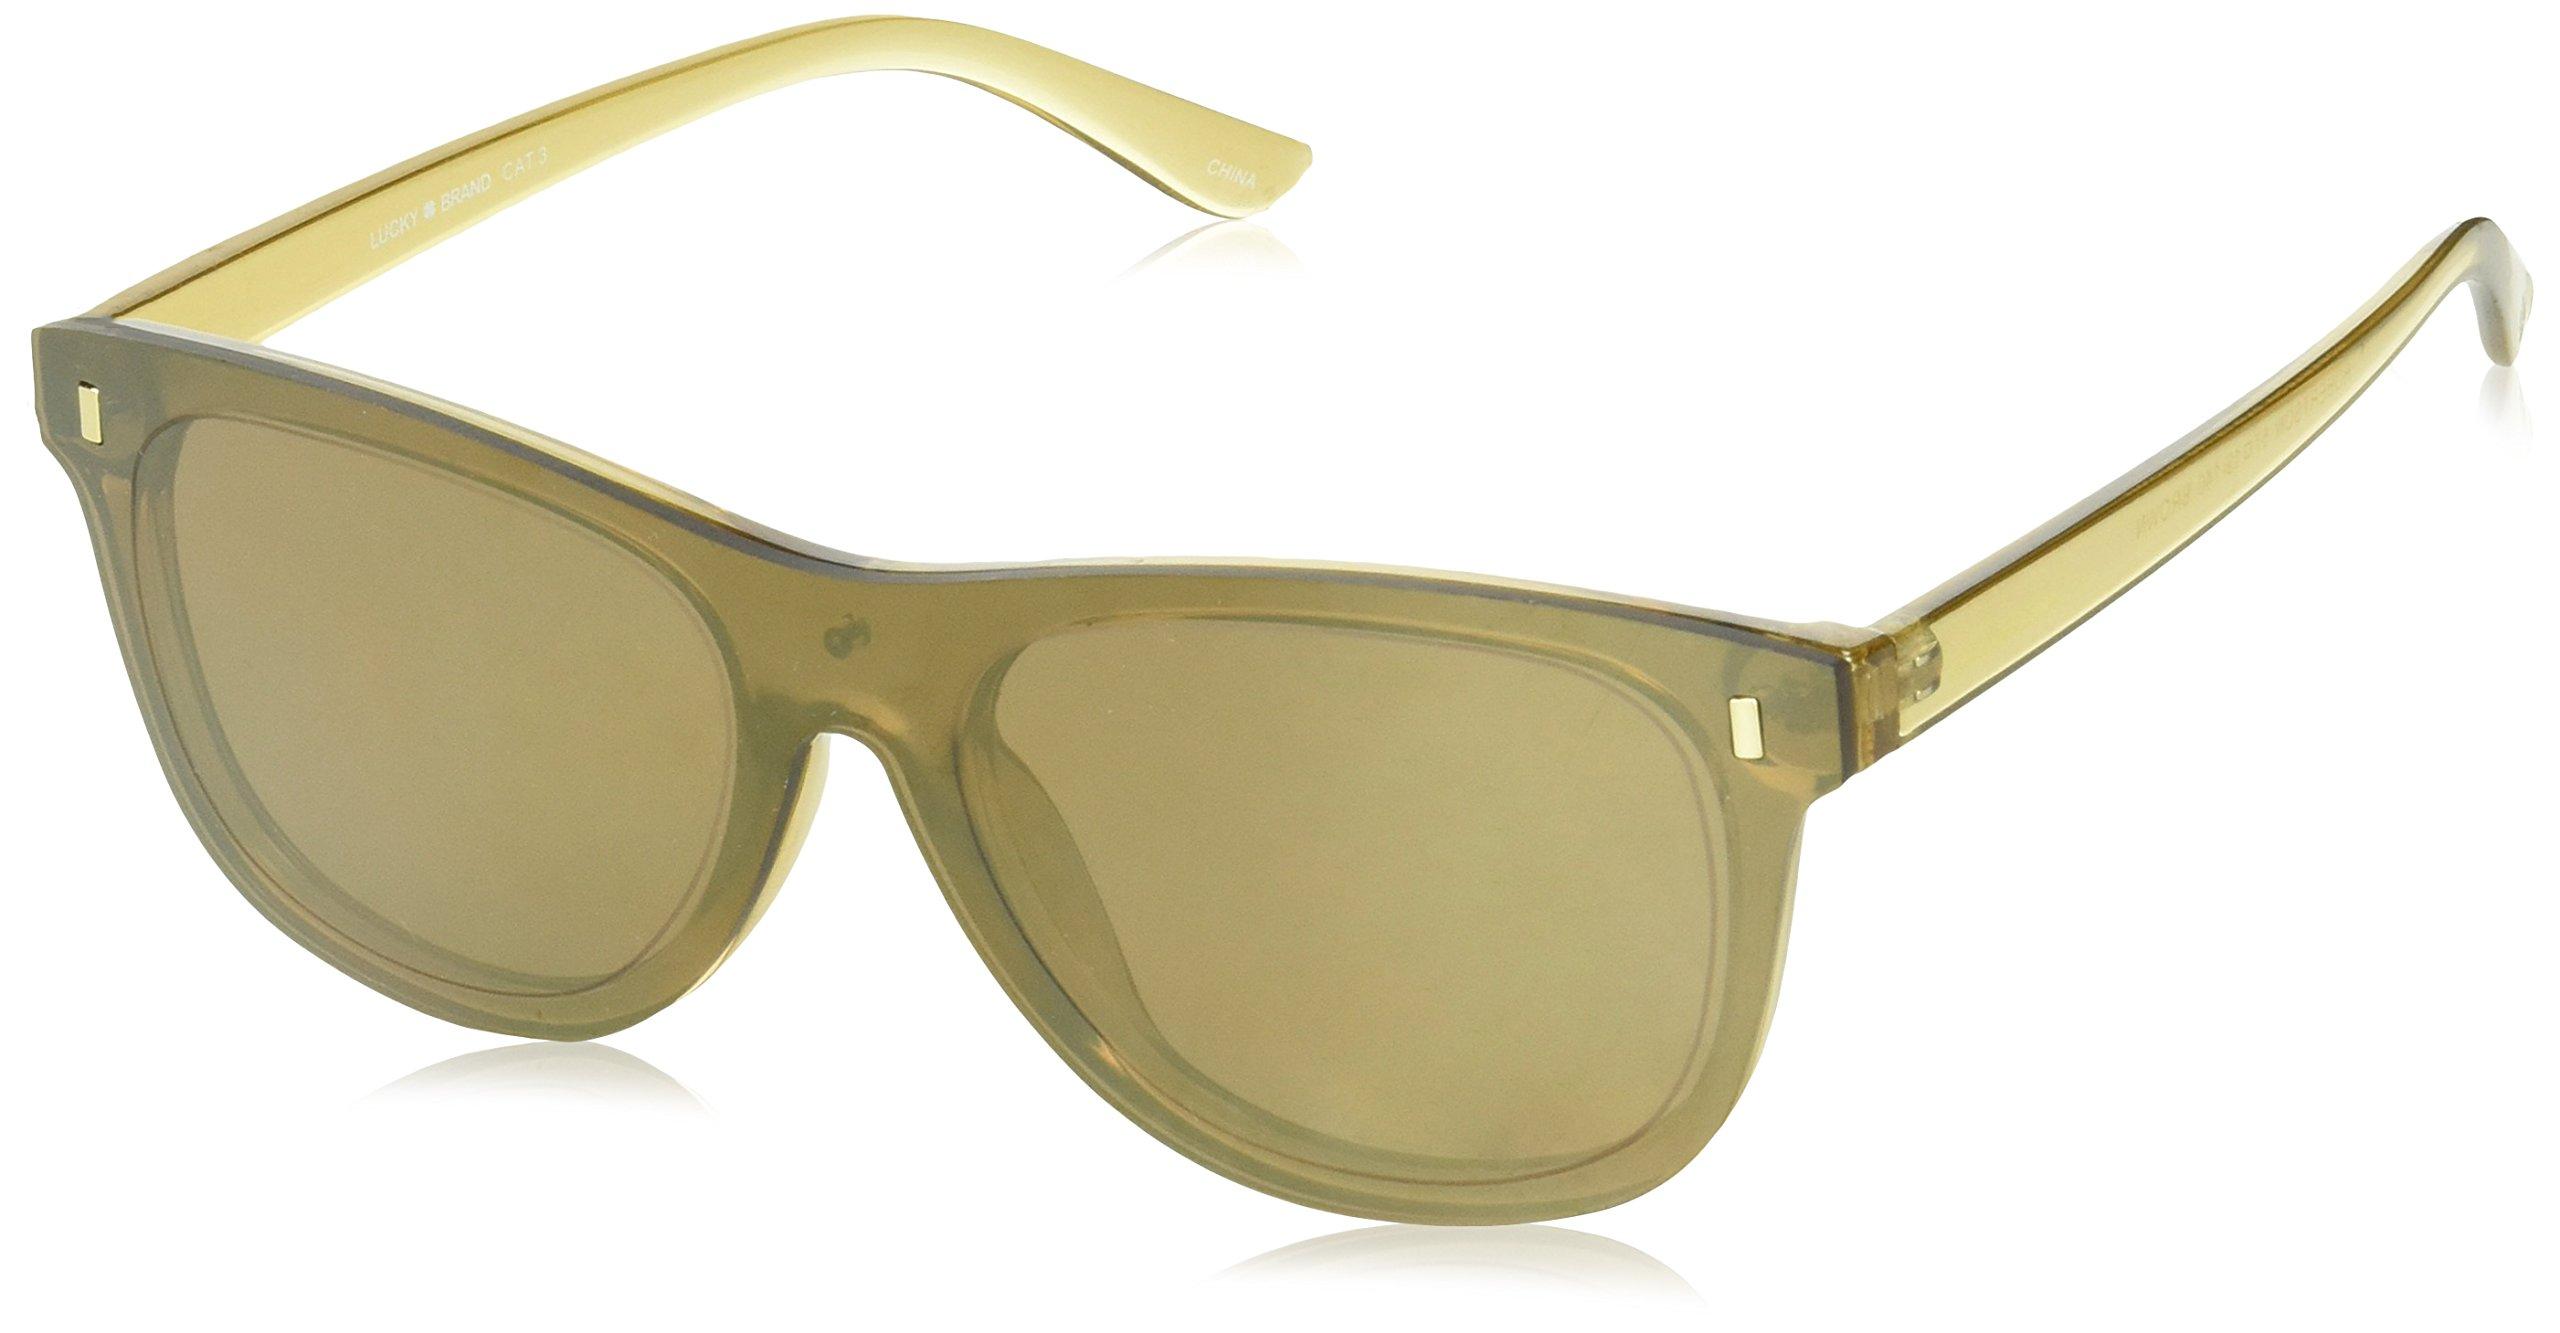 Lucky Robrbro57 Cateye Sunglasses, Brown, 57 mm